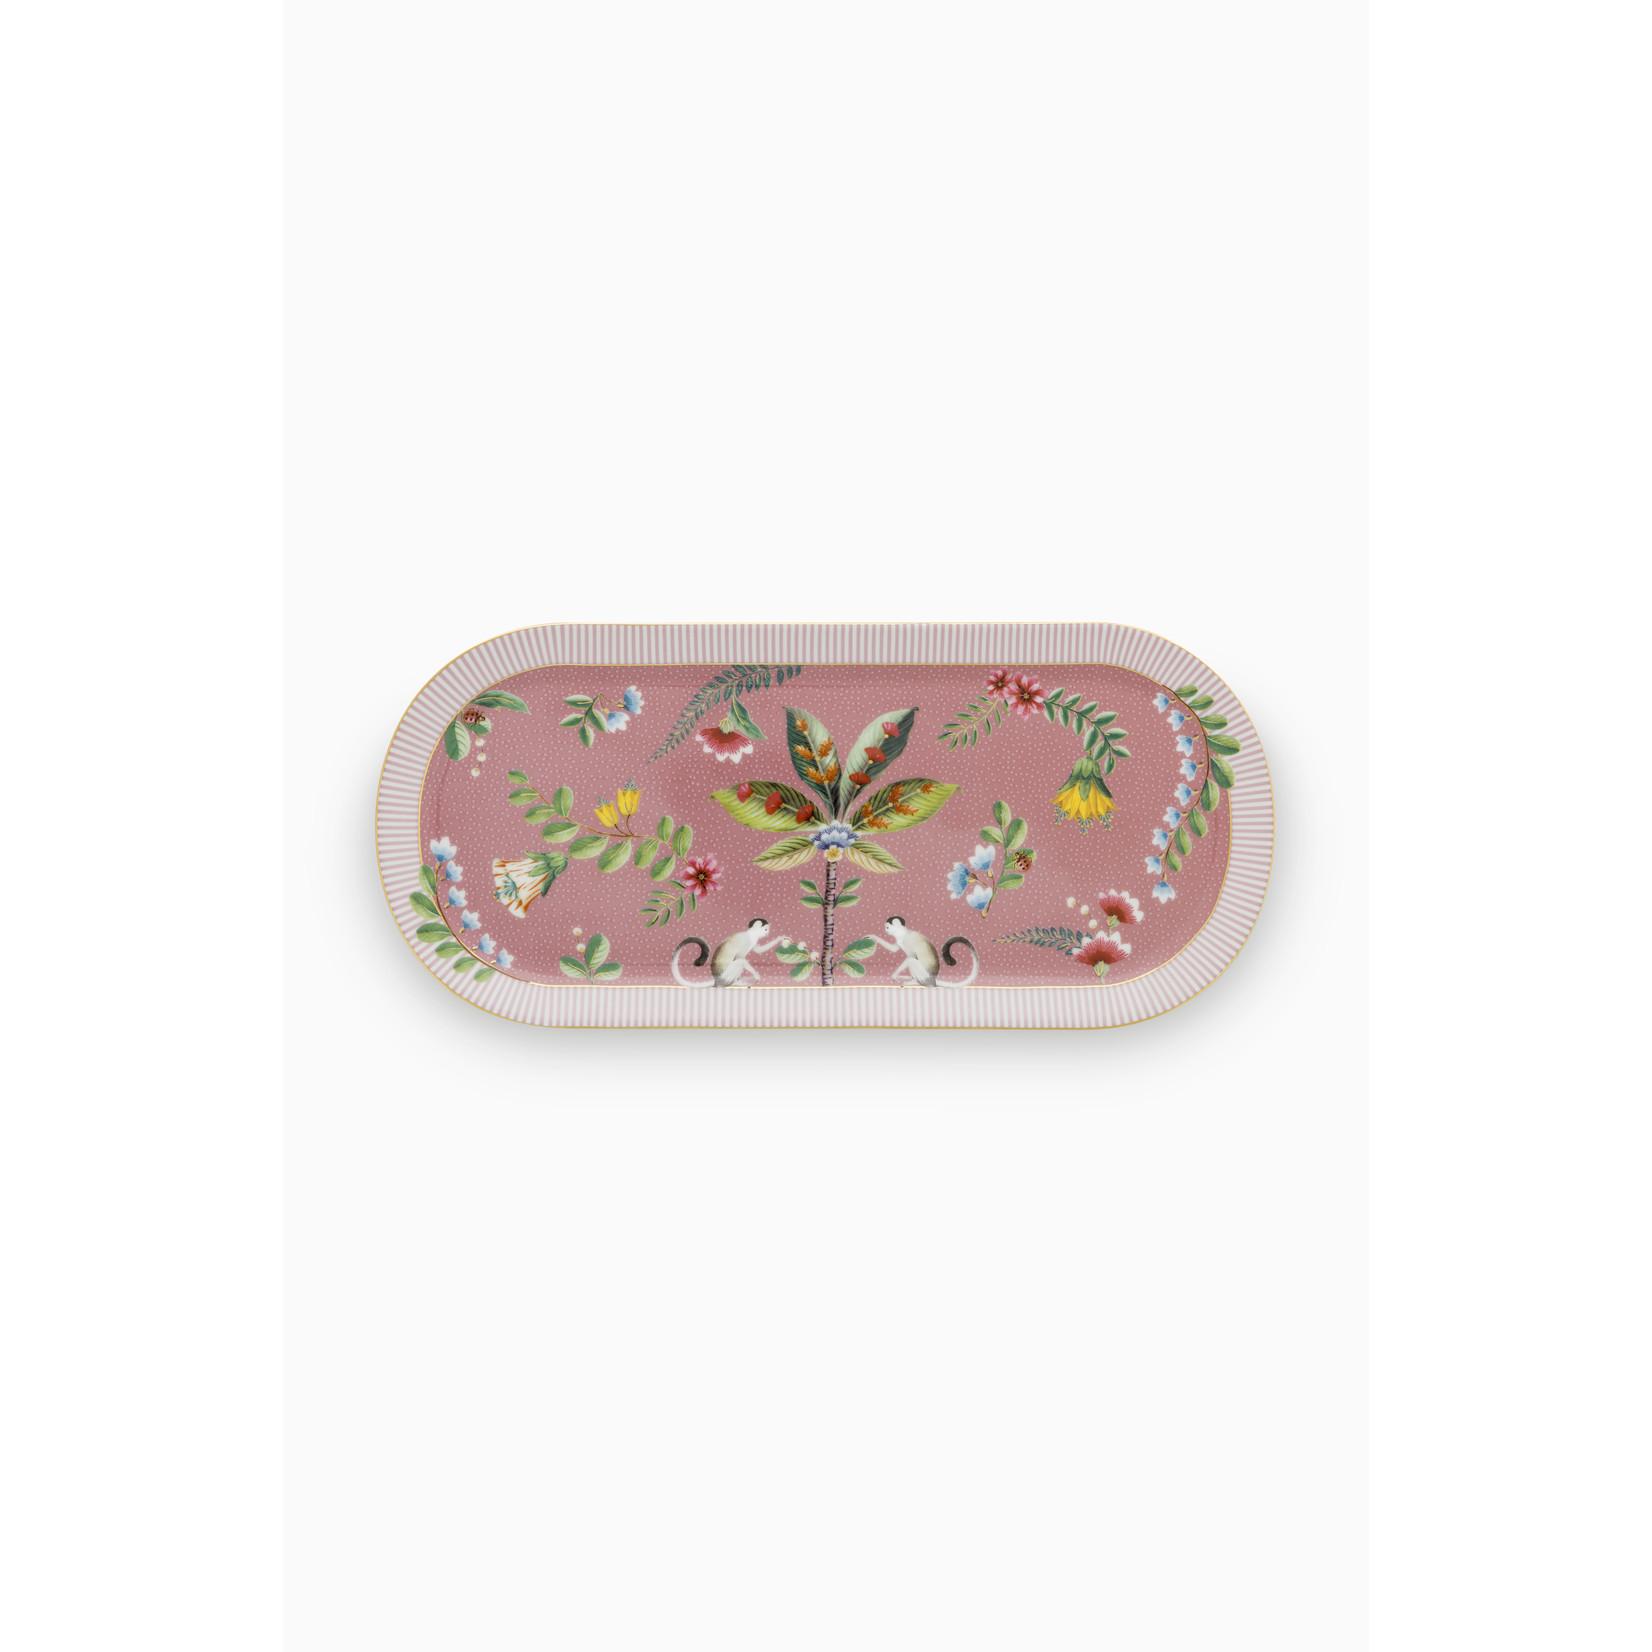 PIP Studio Cake Tray La Majorelle Pink 33.3x15.5cm